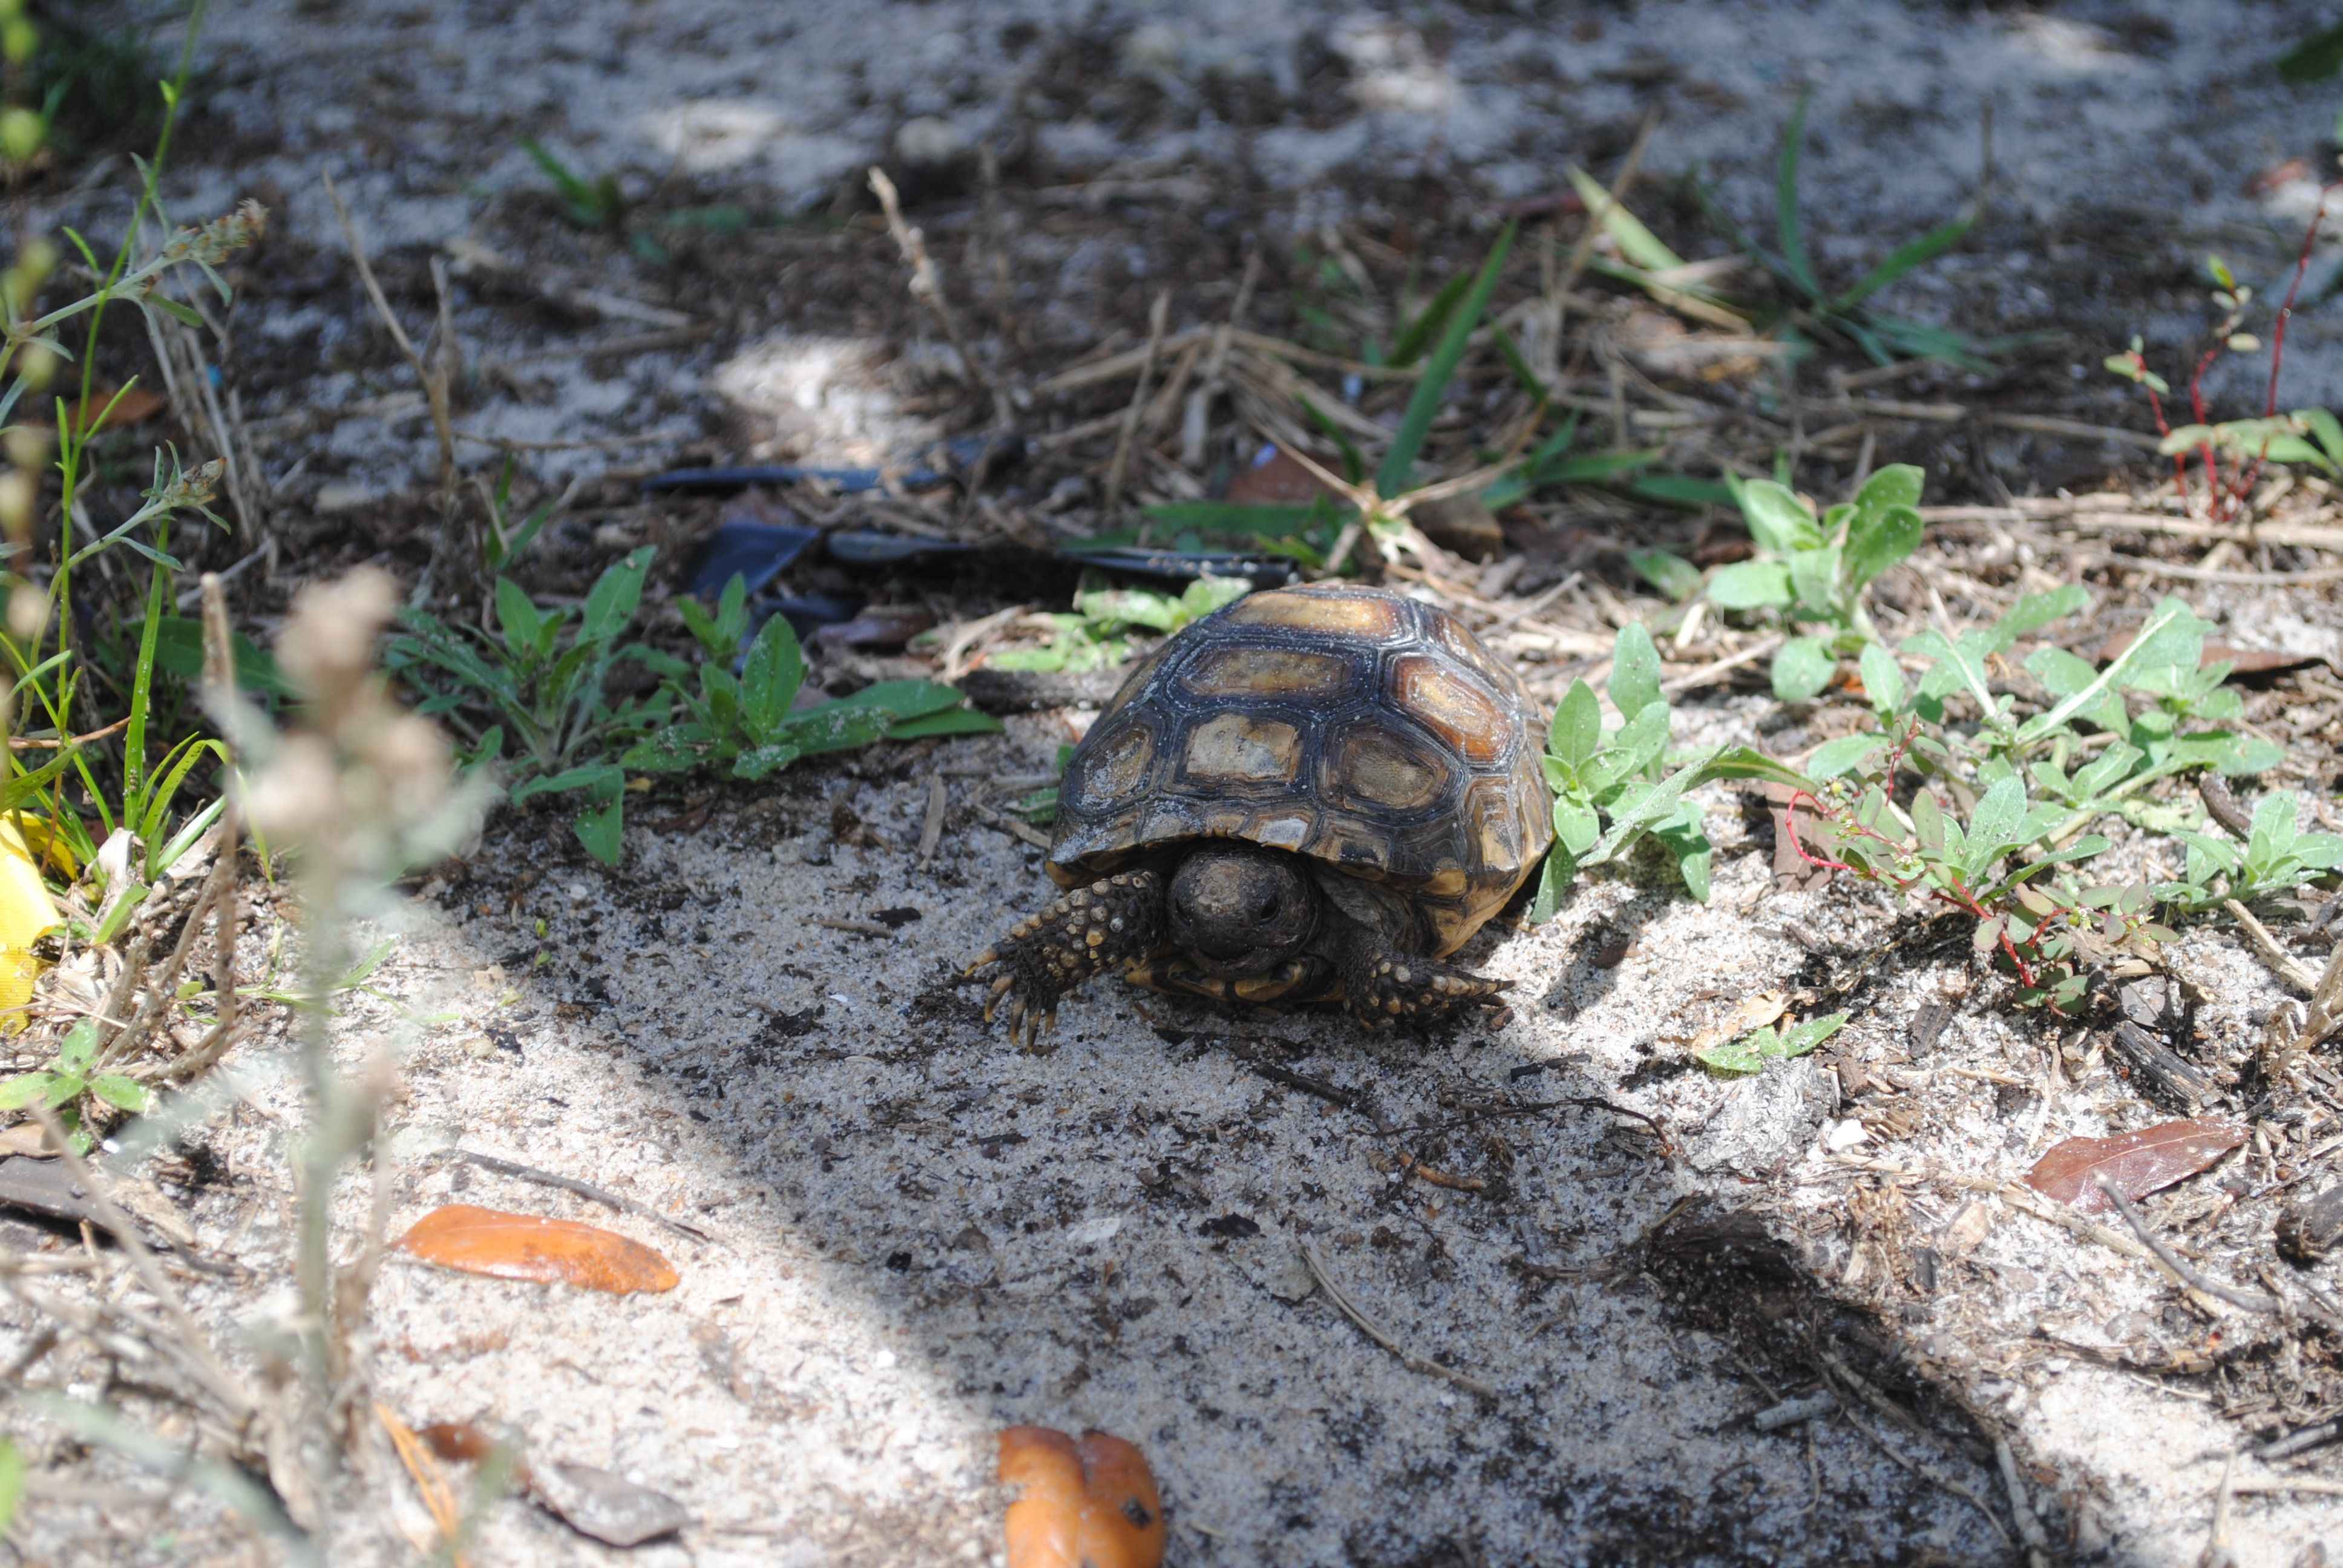 A baby gopher tortoise from my backyard—Chuluota, Florida